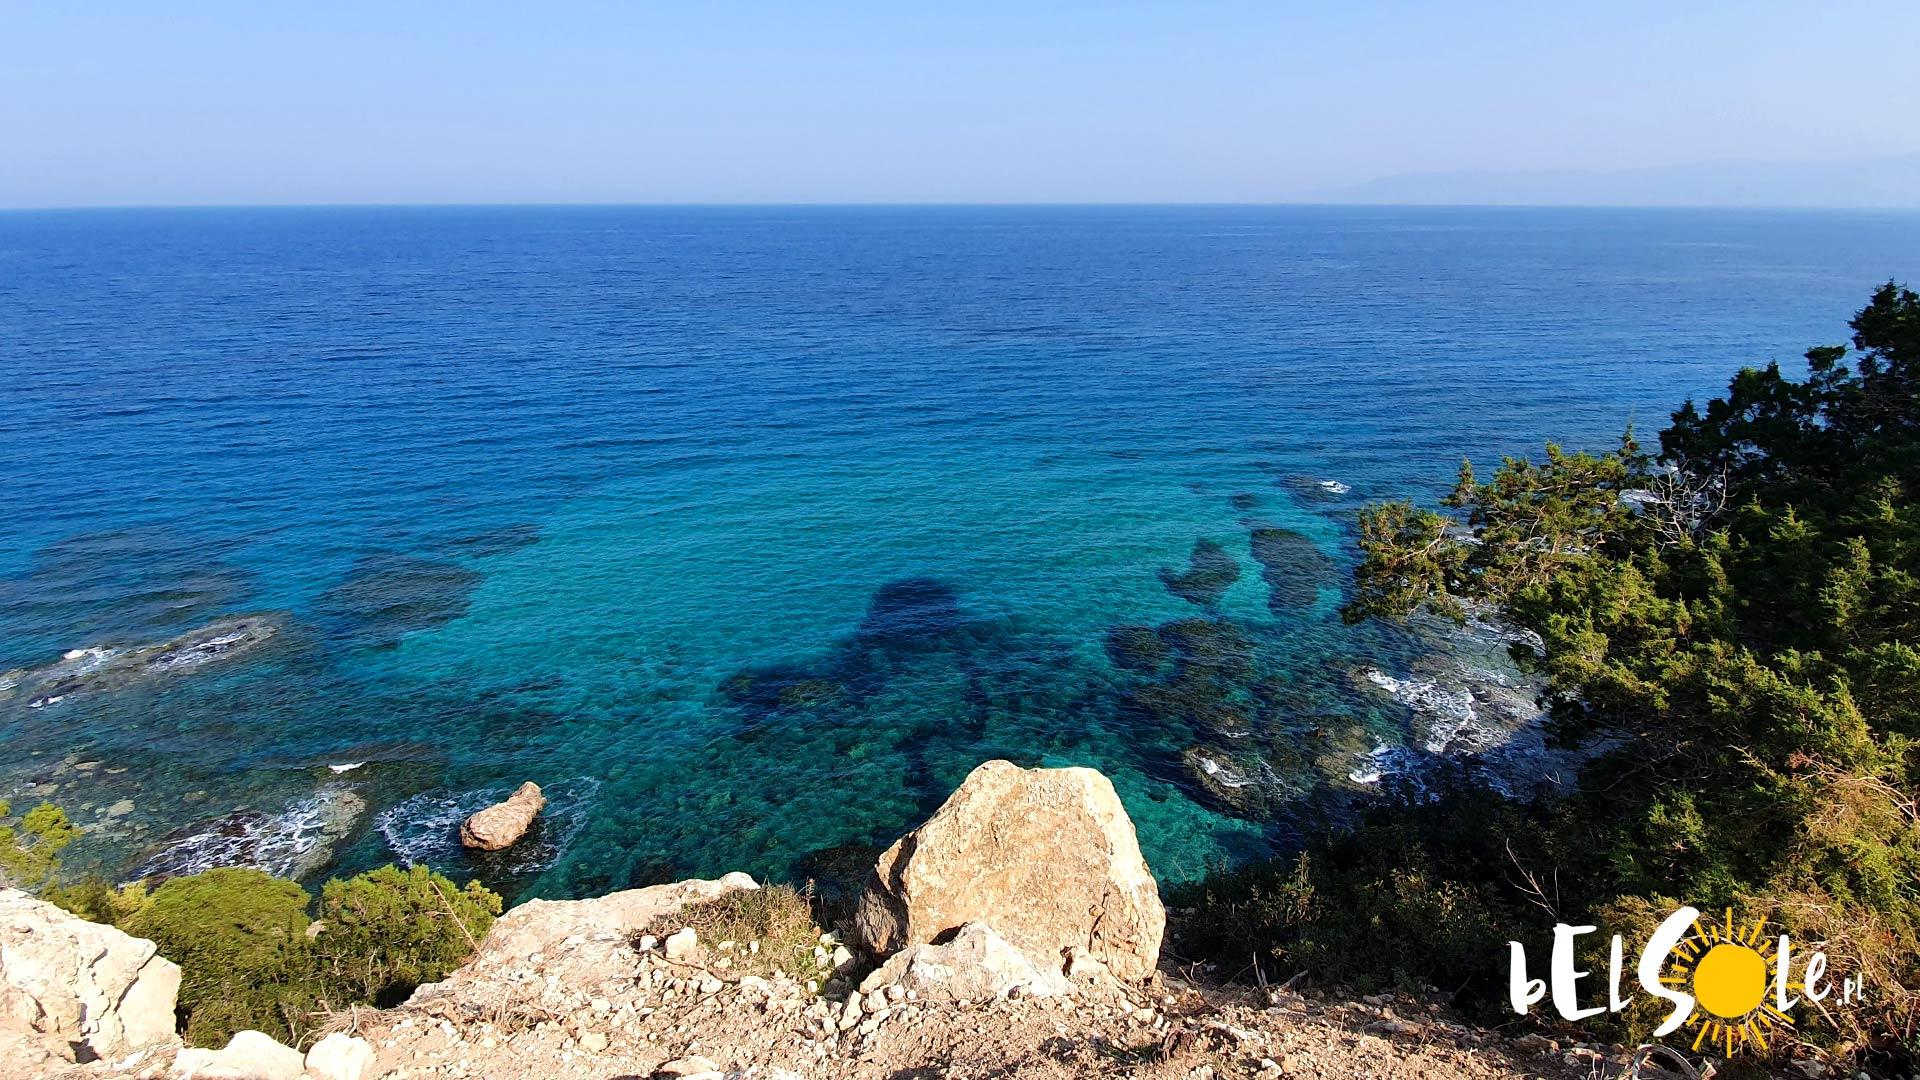 Cypr jaki kontynent?